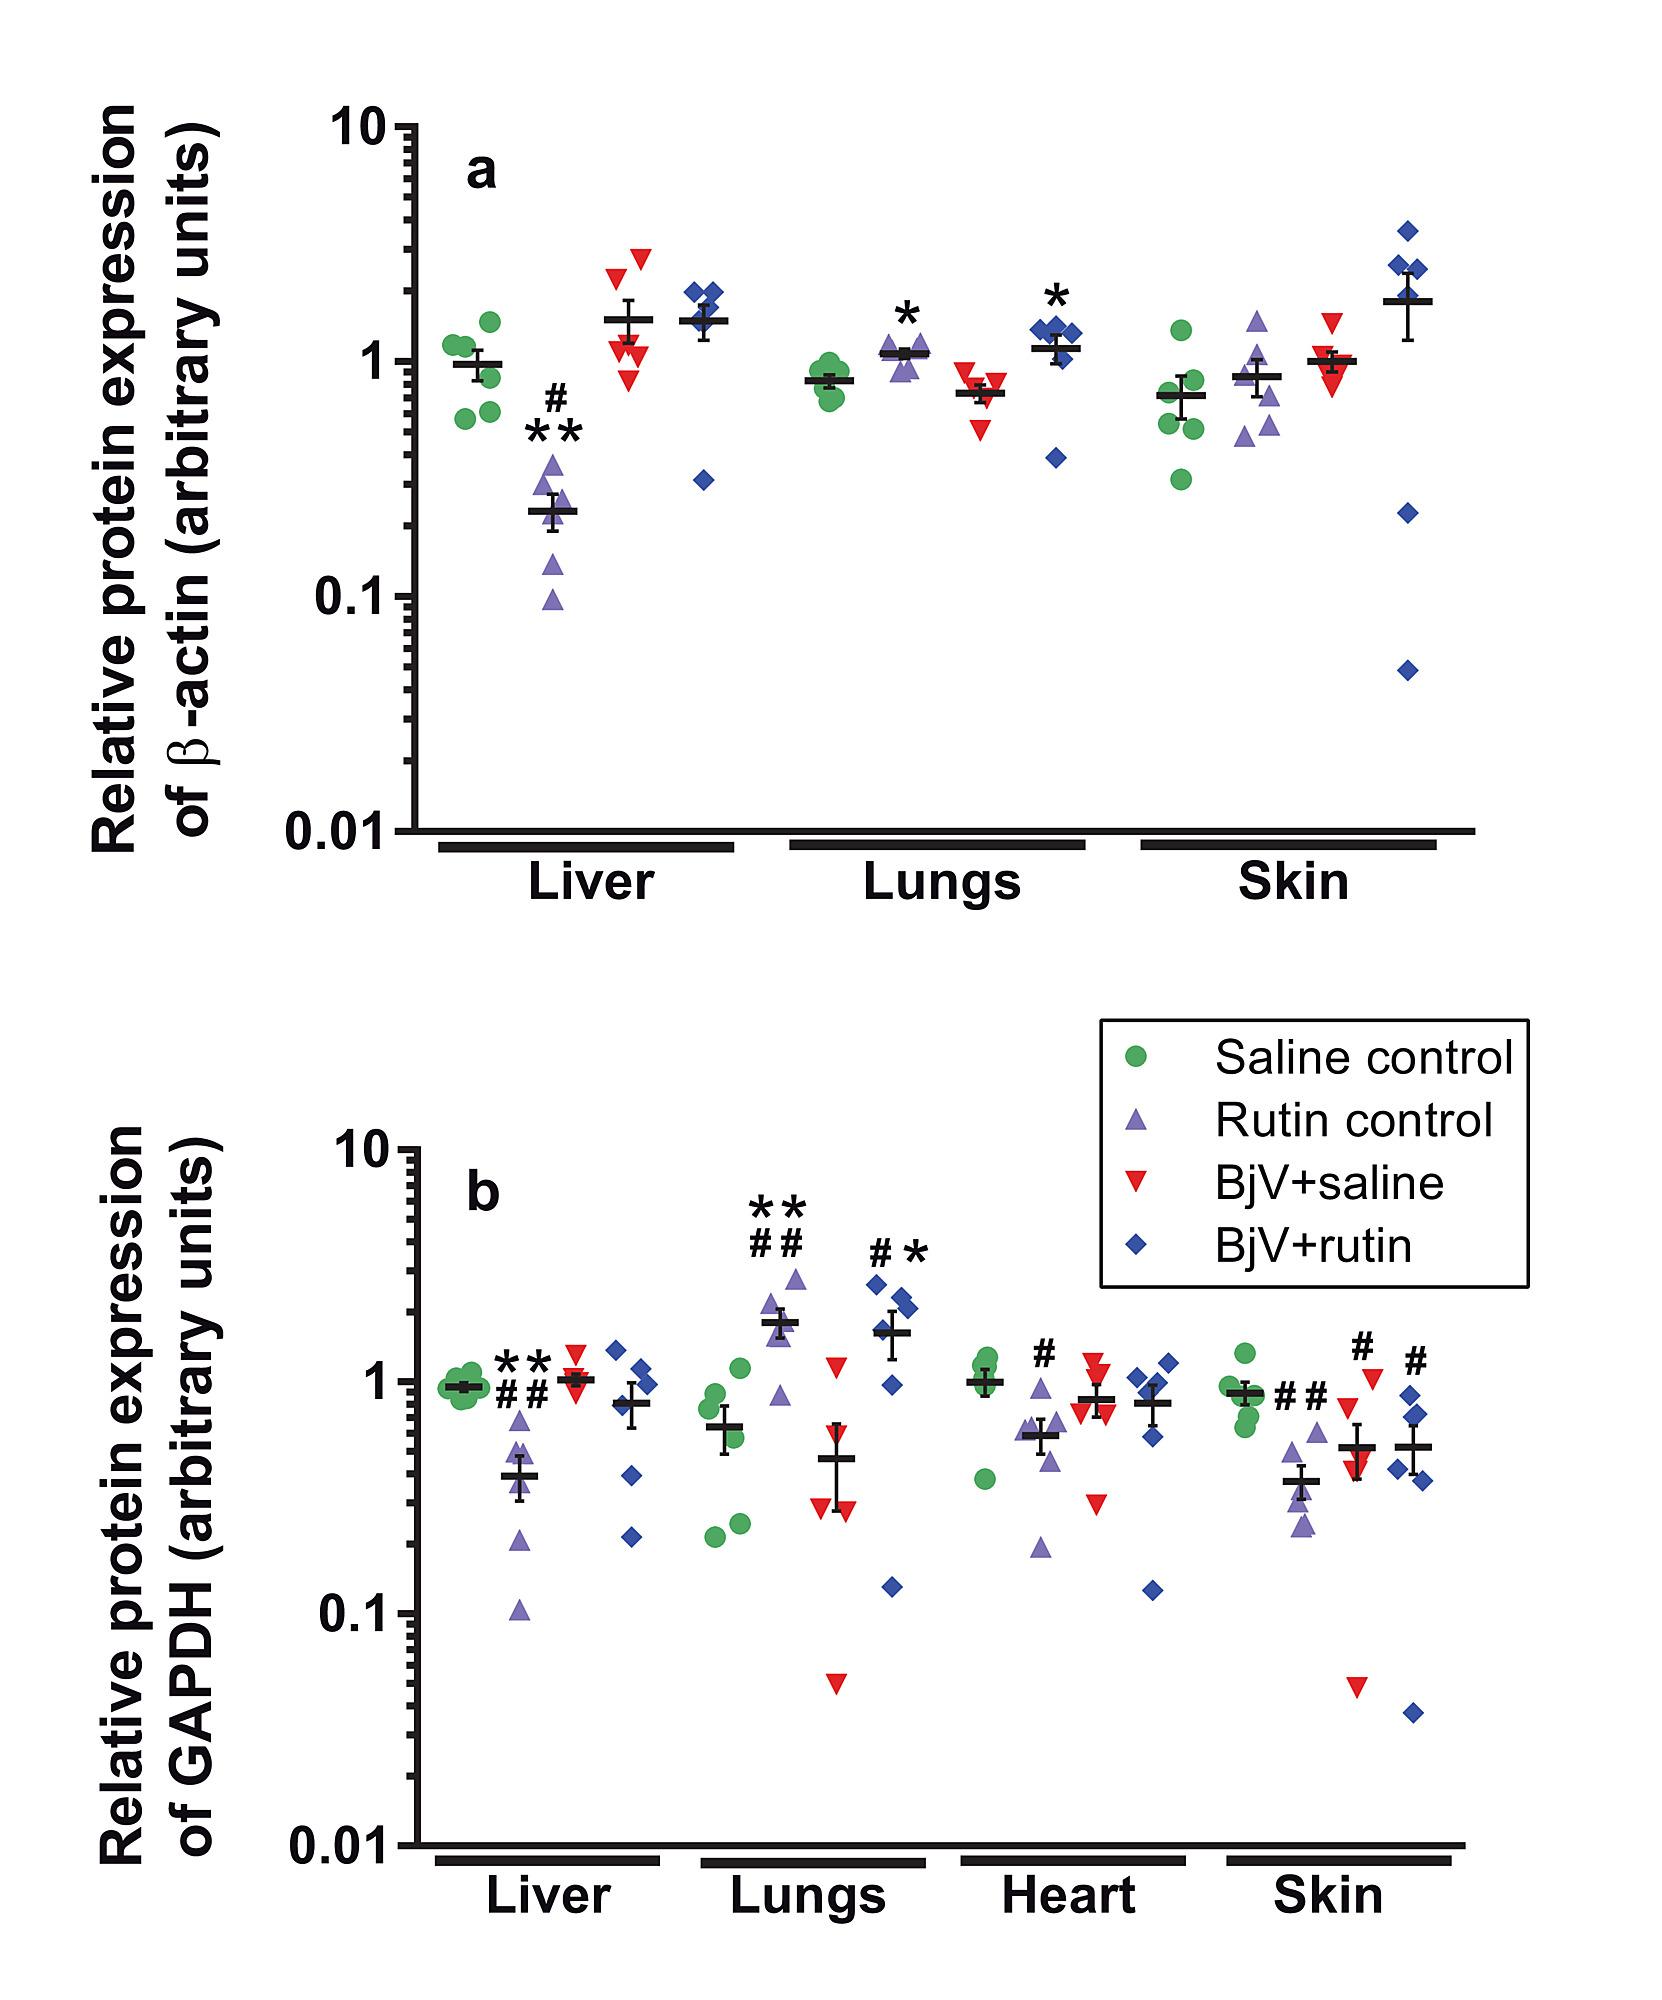 rutin (quercetin 3 rutinoside) modulates the hemostatic disturbances